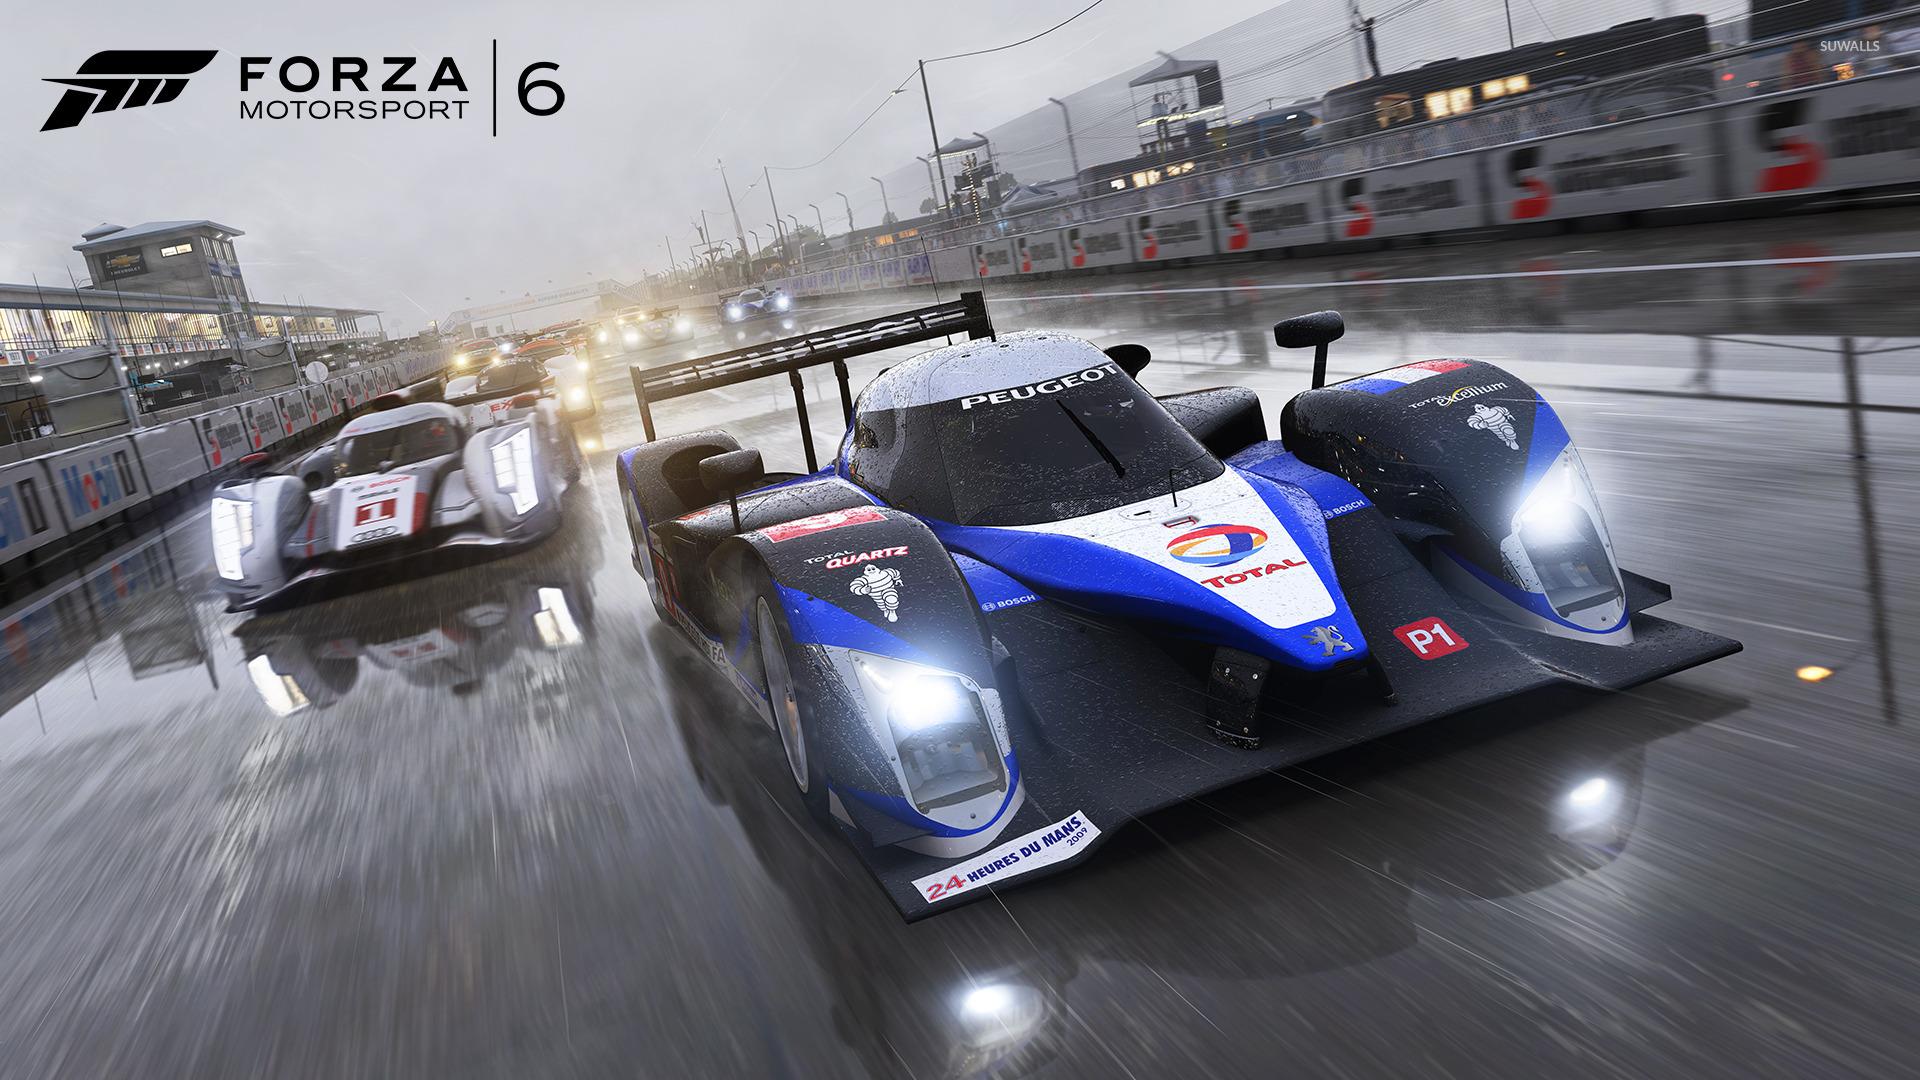 Forza Motorsport 6 wallpaper   Game wallpapers   44850 1920x1080